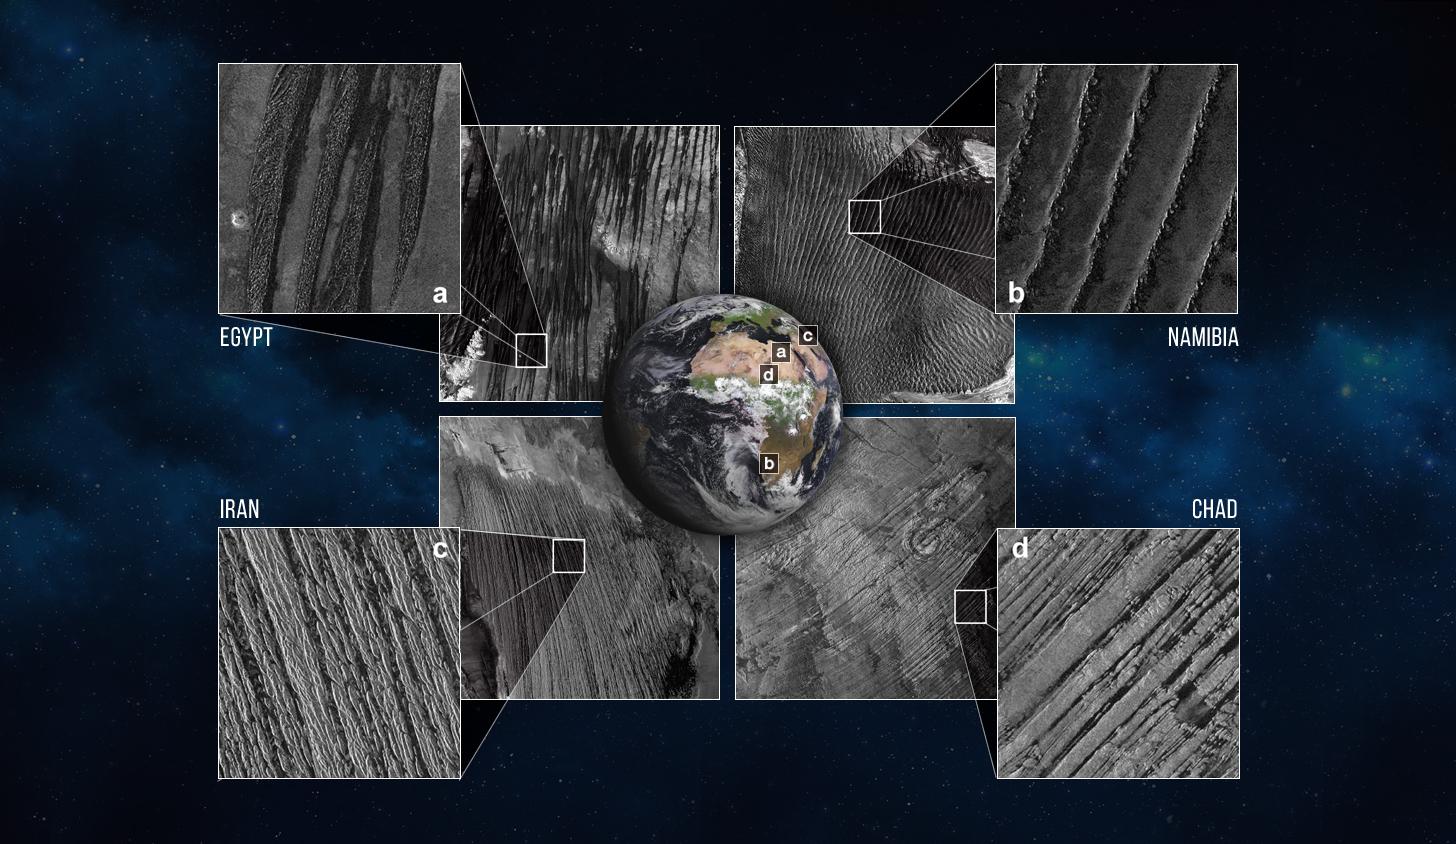 1567215633410-Earth_dunes_and_yardangs_TerraSAR-X_radar.jpg